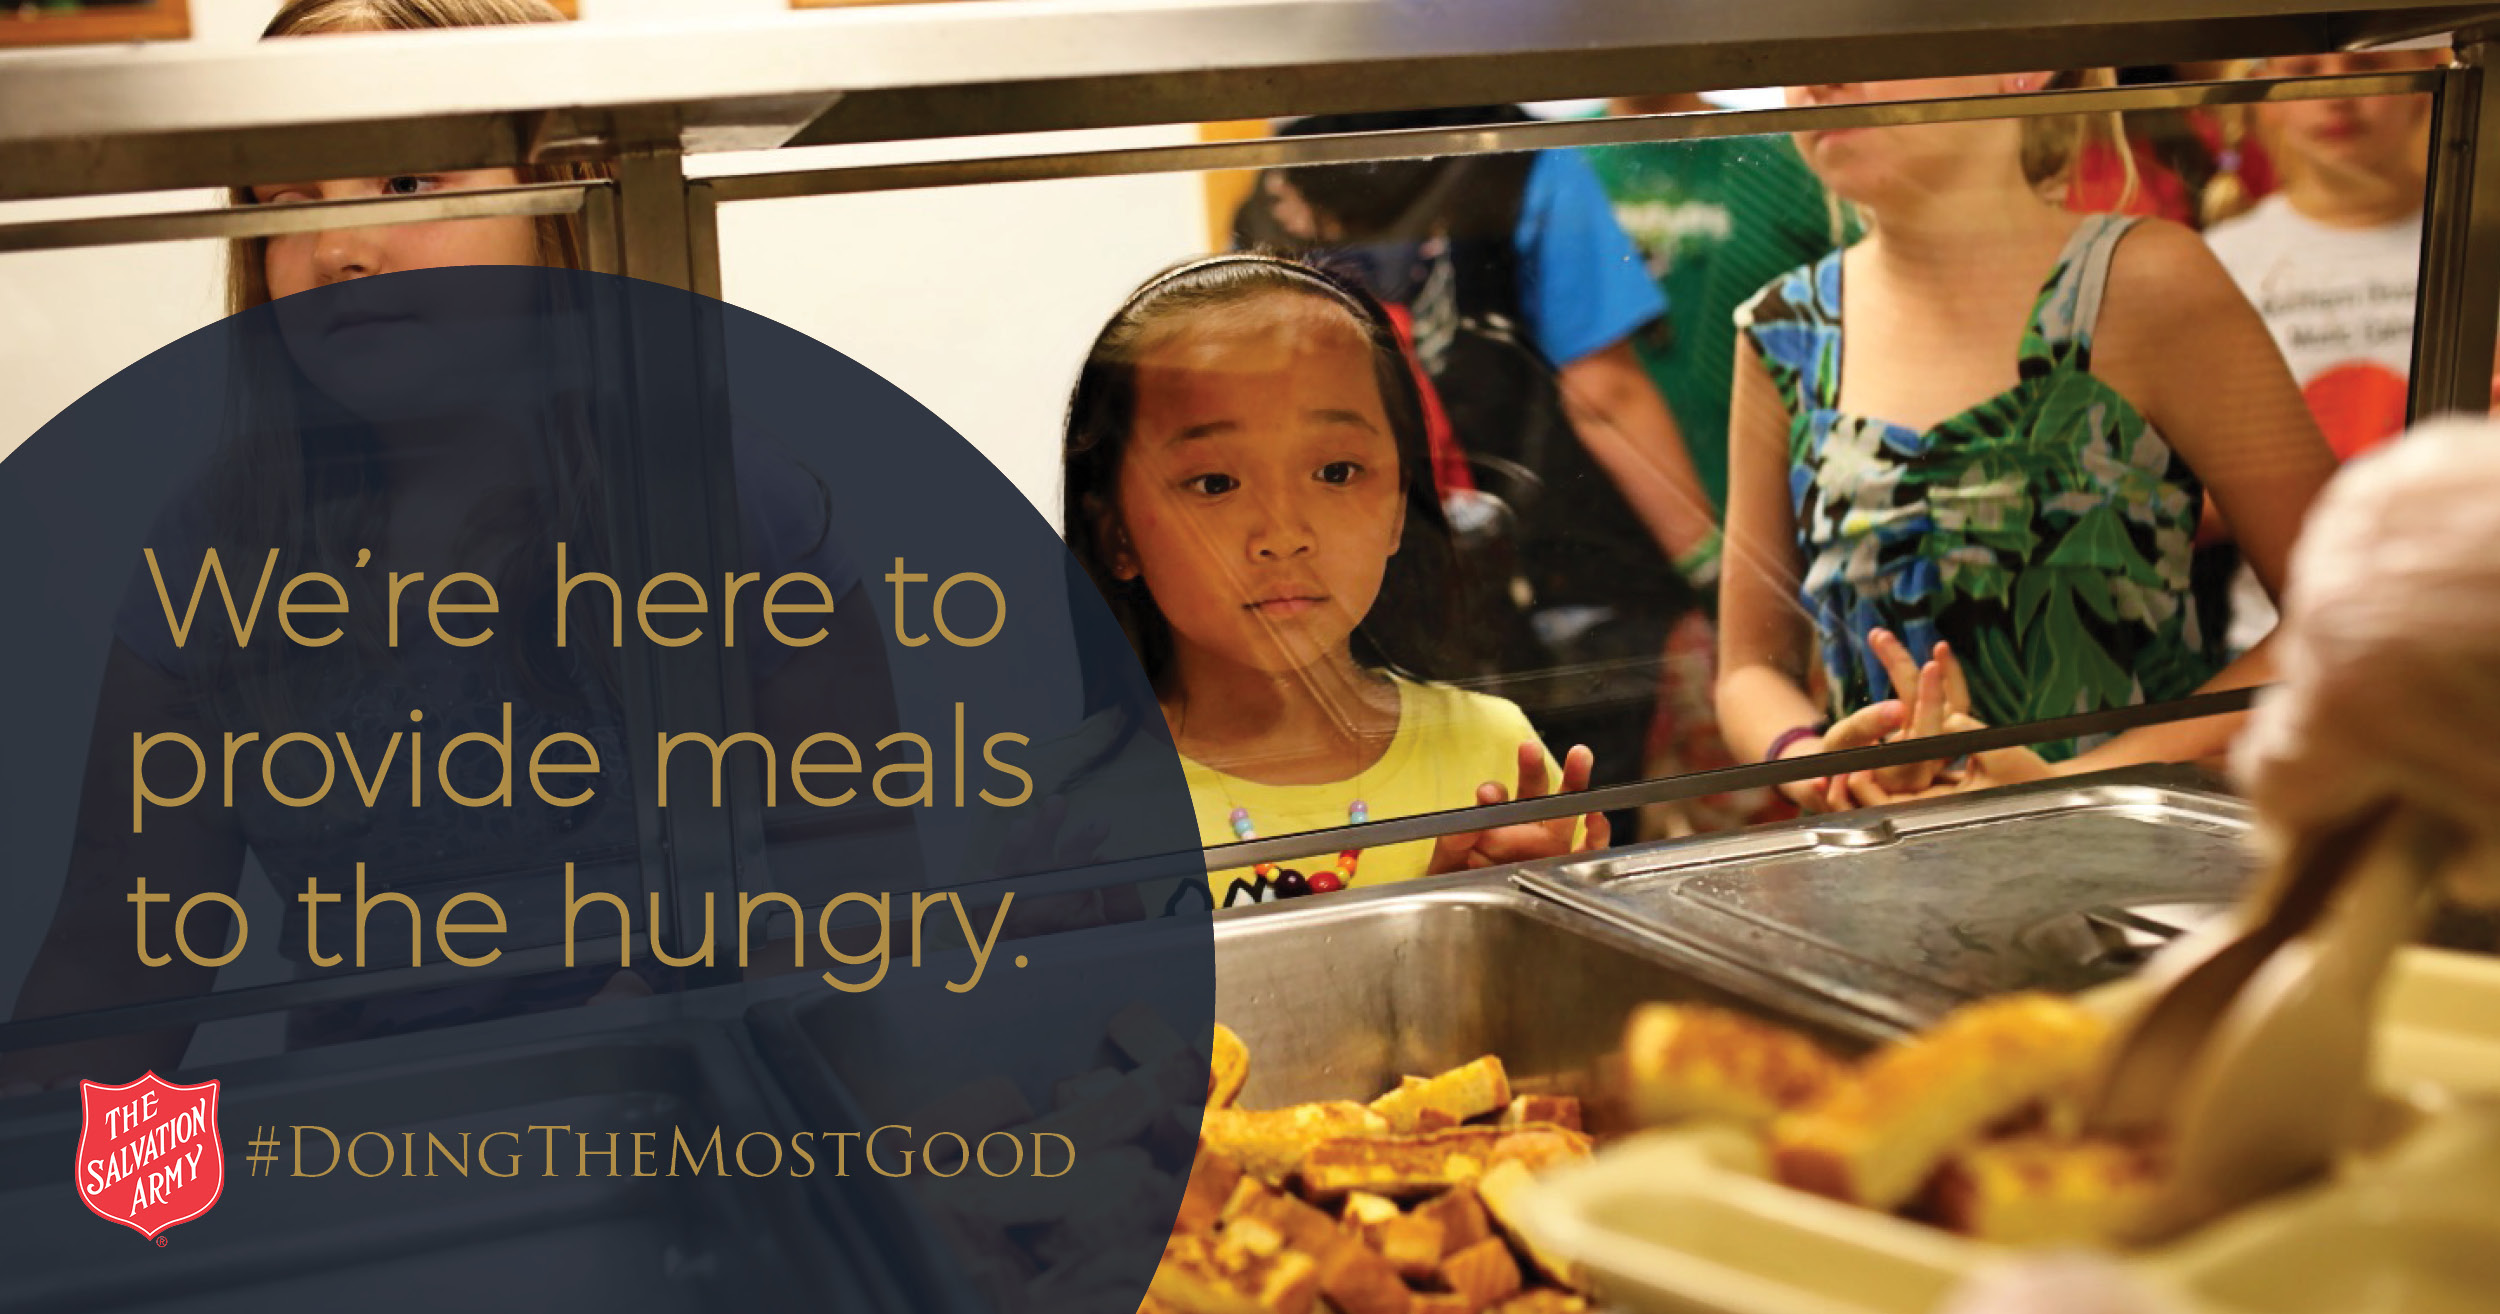 The Salvation Army Feeding Program